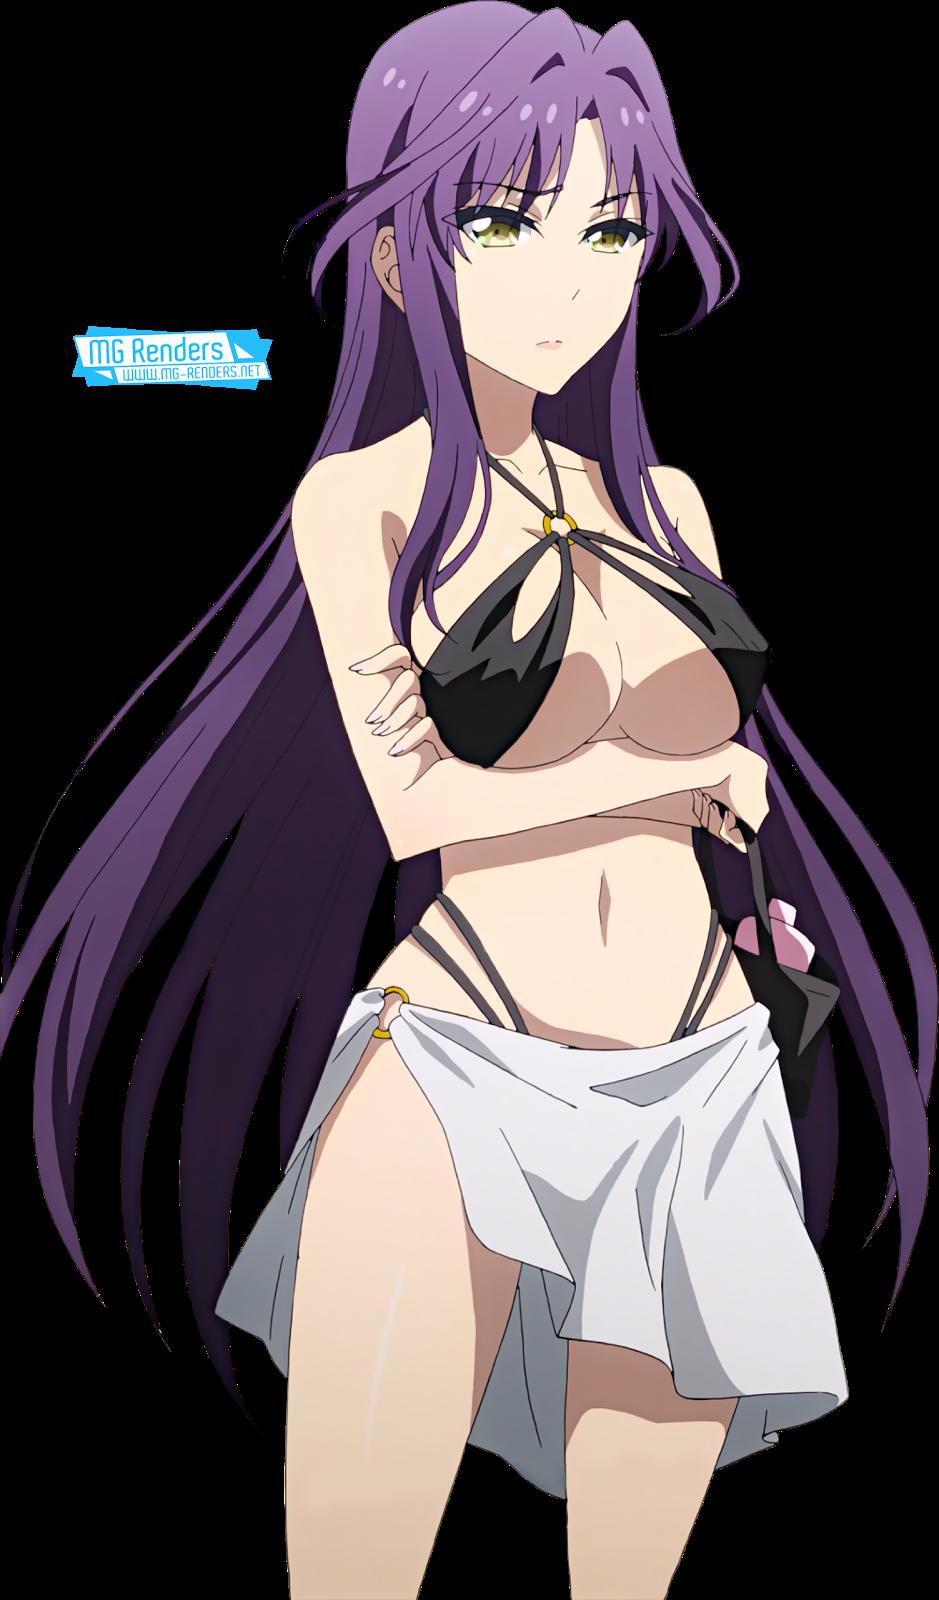 Tags: Anime, Render,  Goshouin Kyou,  Netoge no Yome wa Onnanoko ja Nai to Omotta,  Skirt,  PNG, Image, Picture